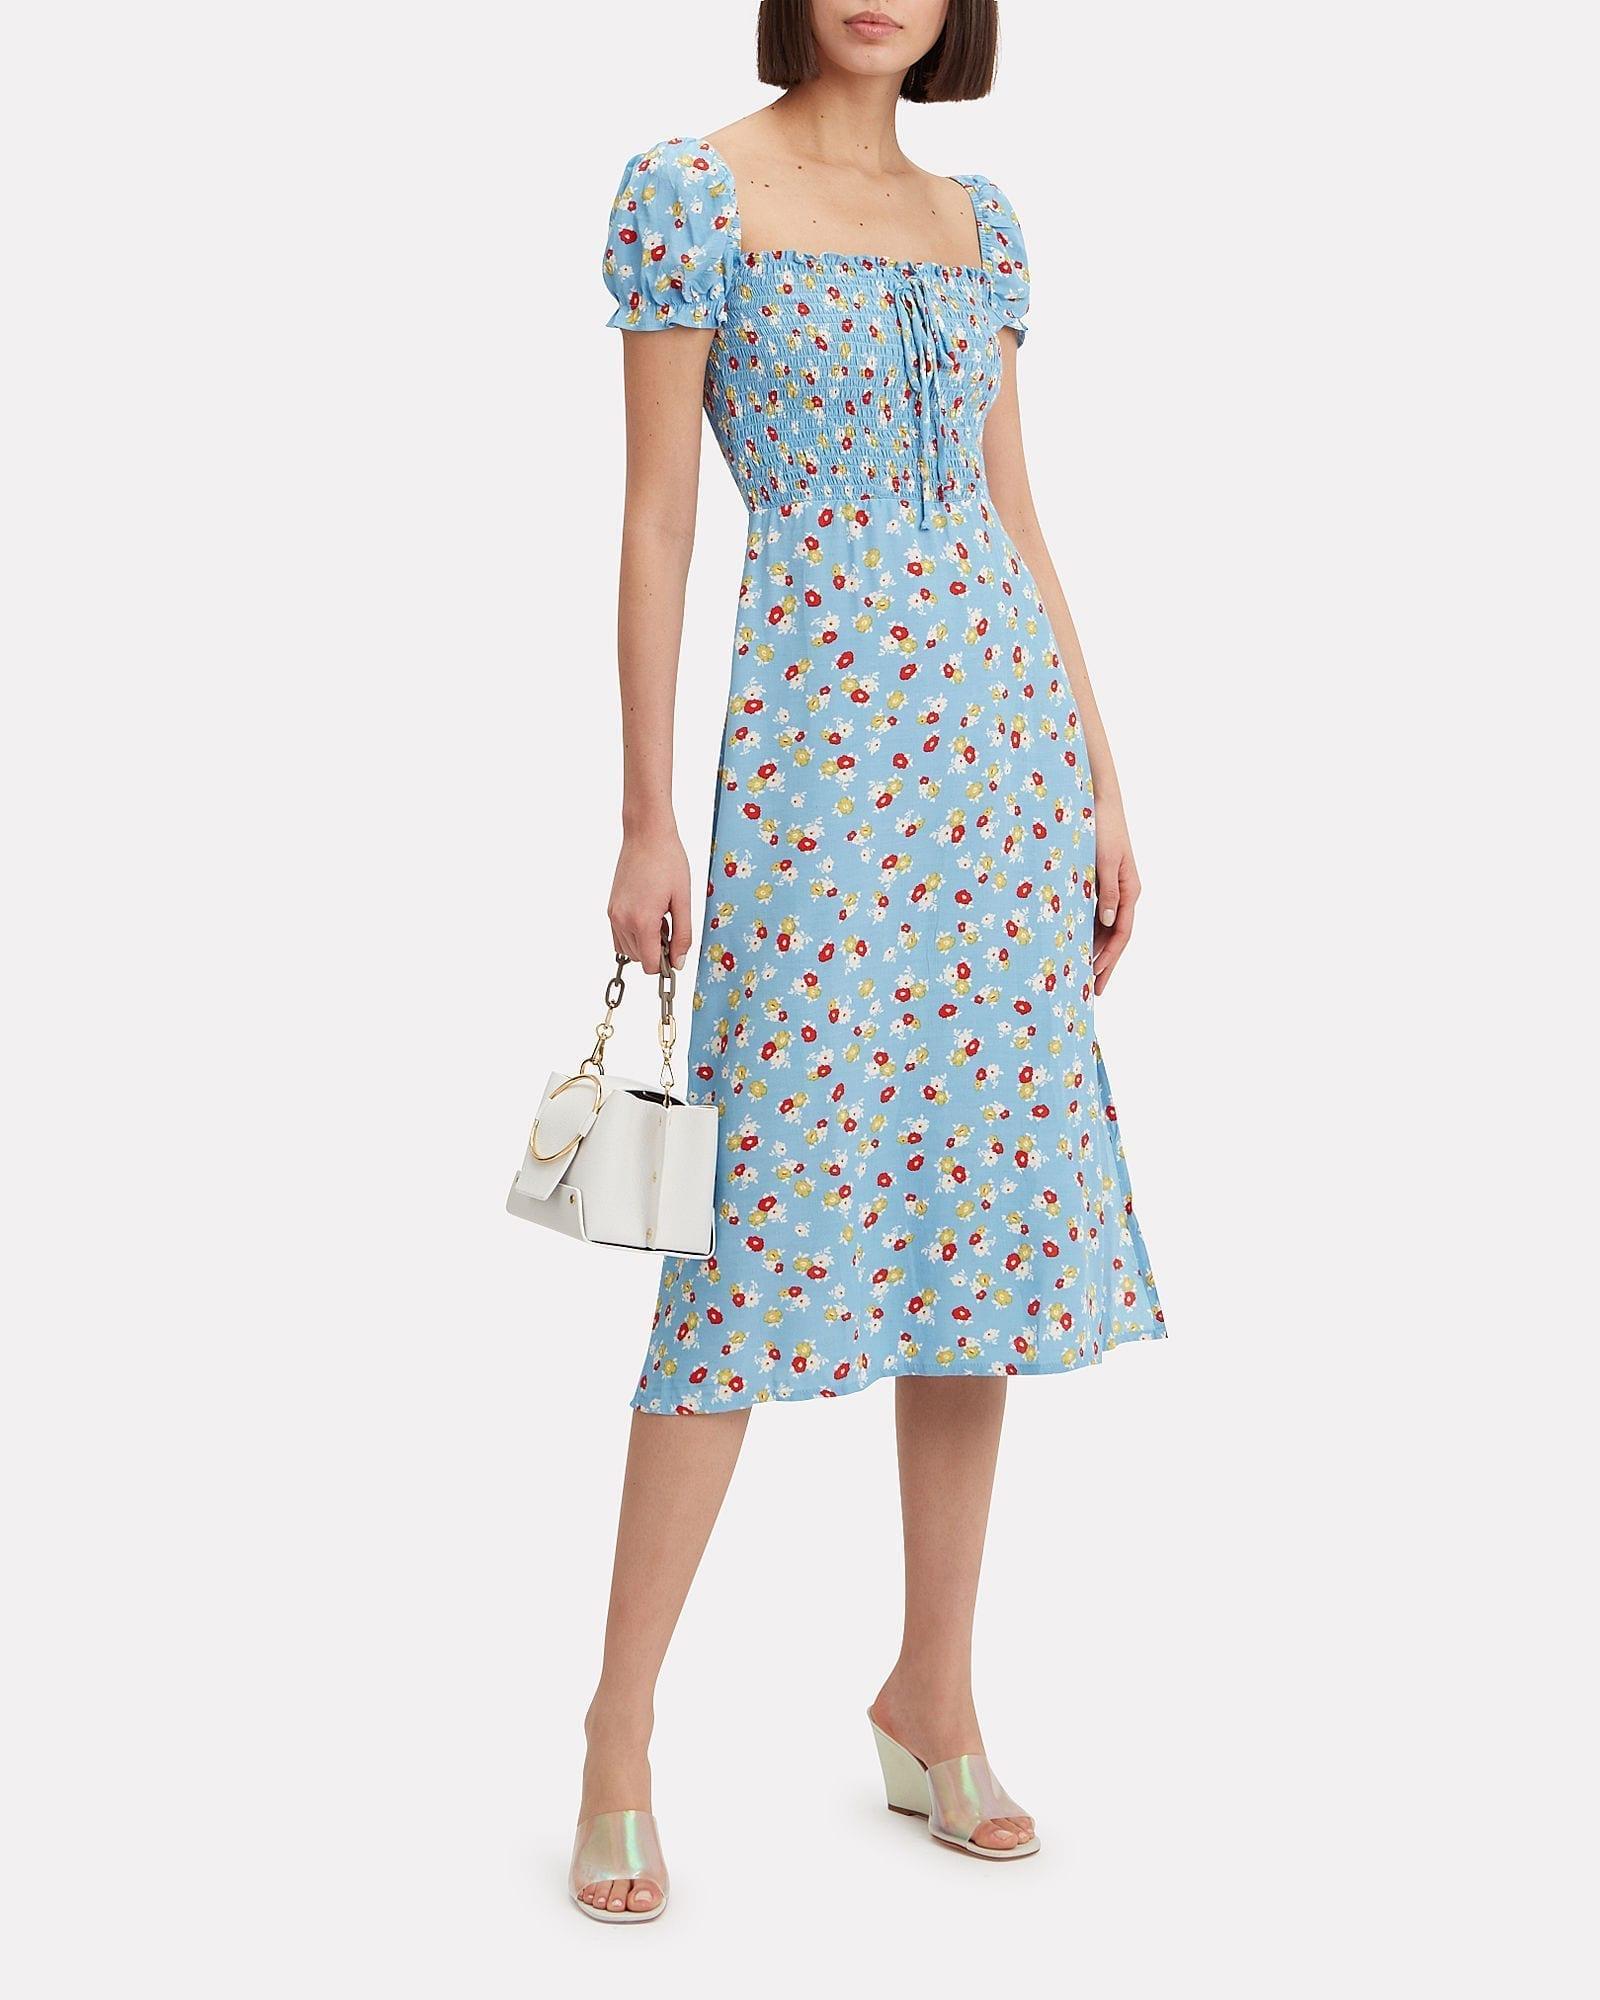 FAITHFULL THE BRAND Jasmine Floral Print Midi Dress